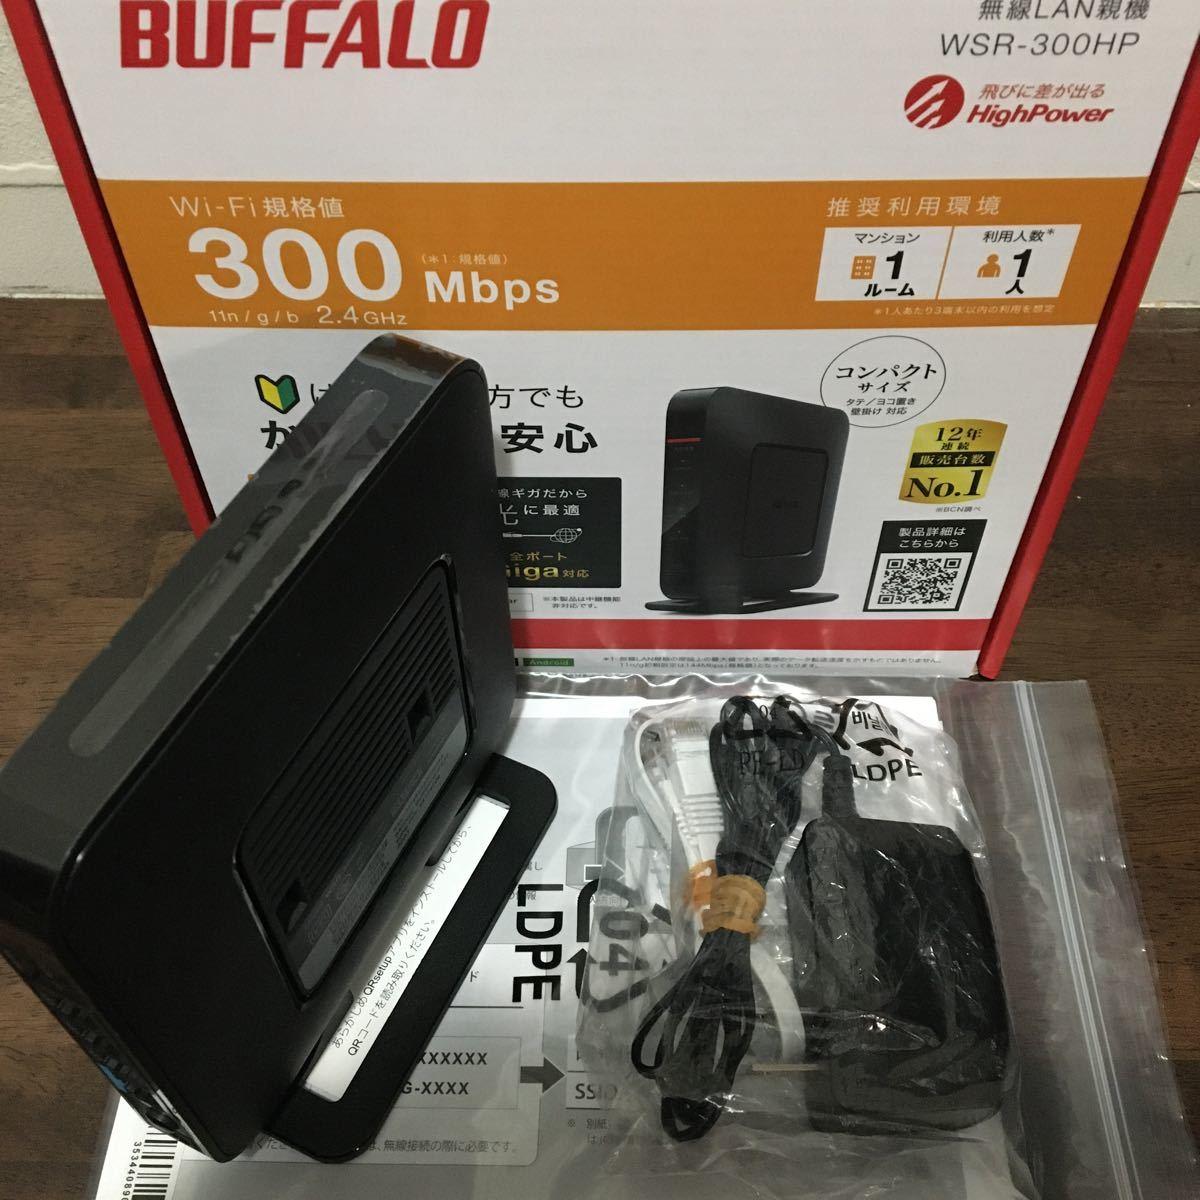 BUFFALO バッファロー WHR-300HP Wi-Fiルーター AirStation 無線LAN親機 Wi-Fi WiFi